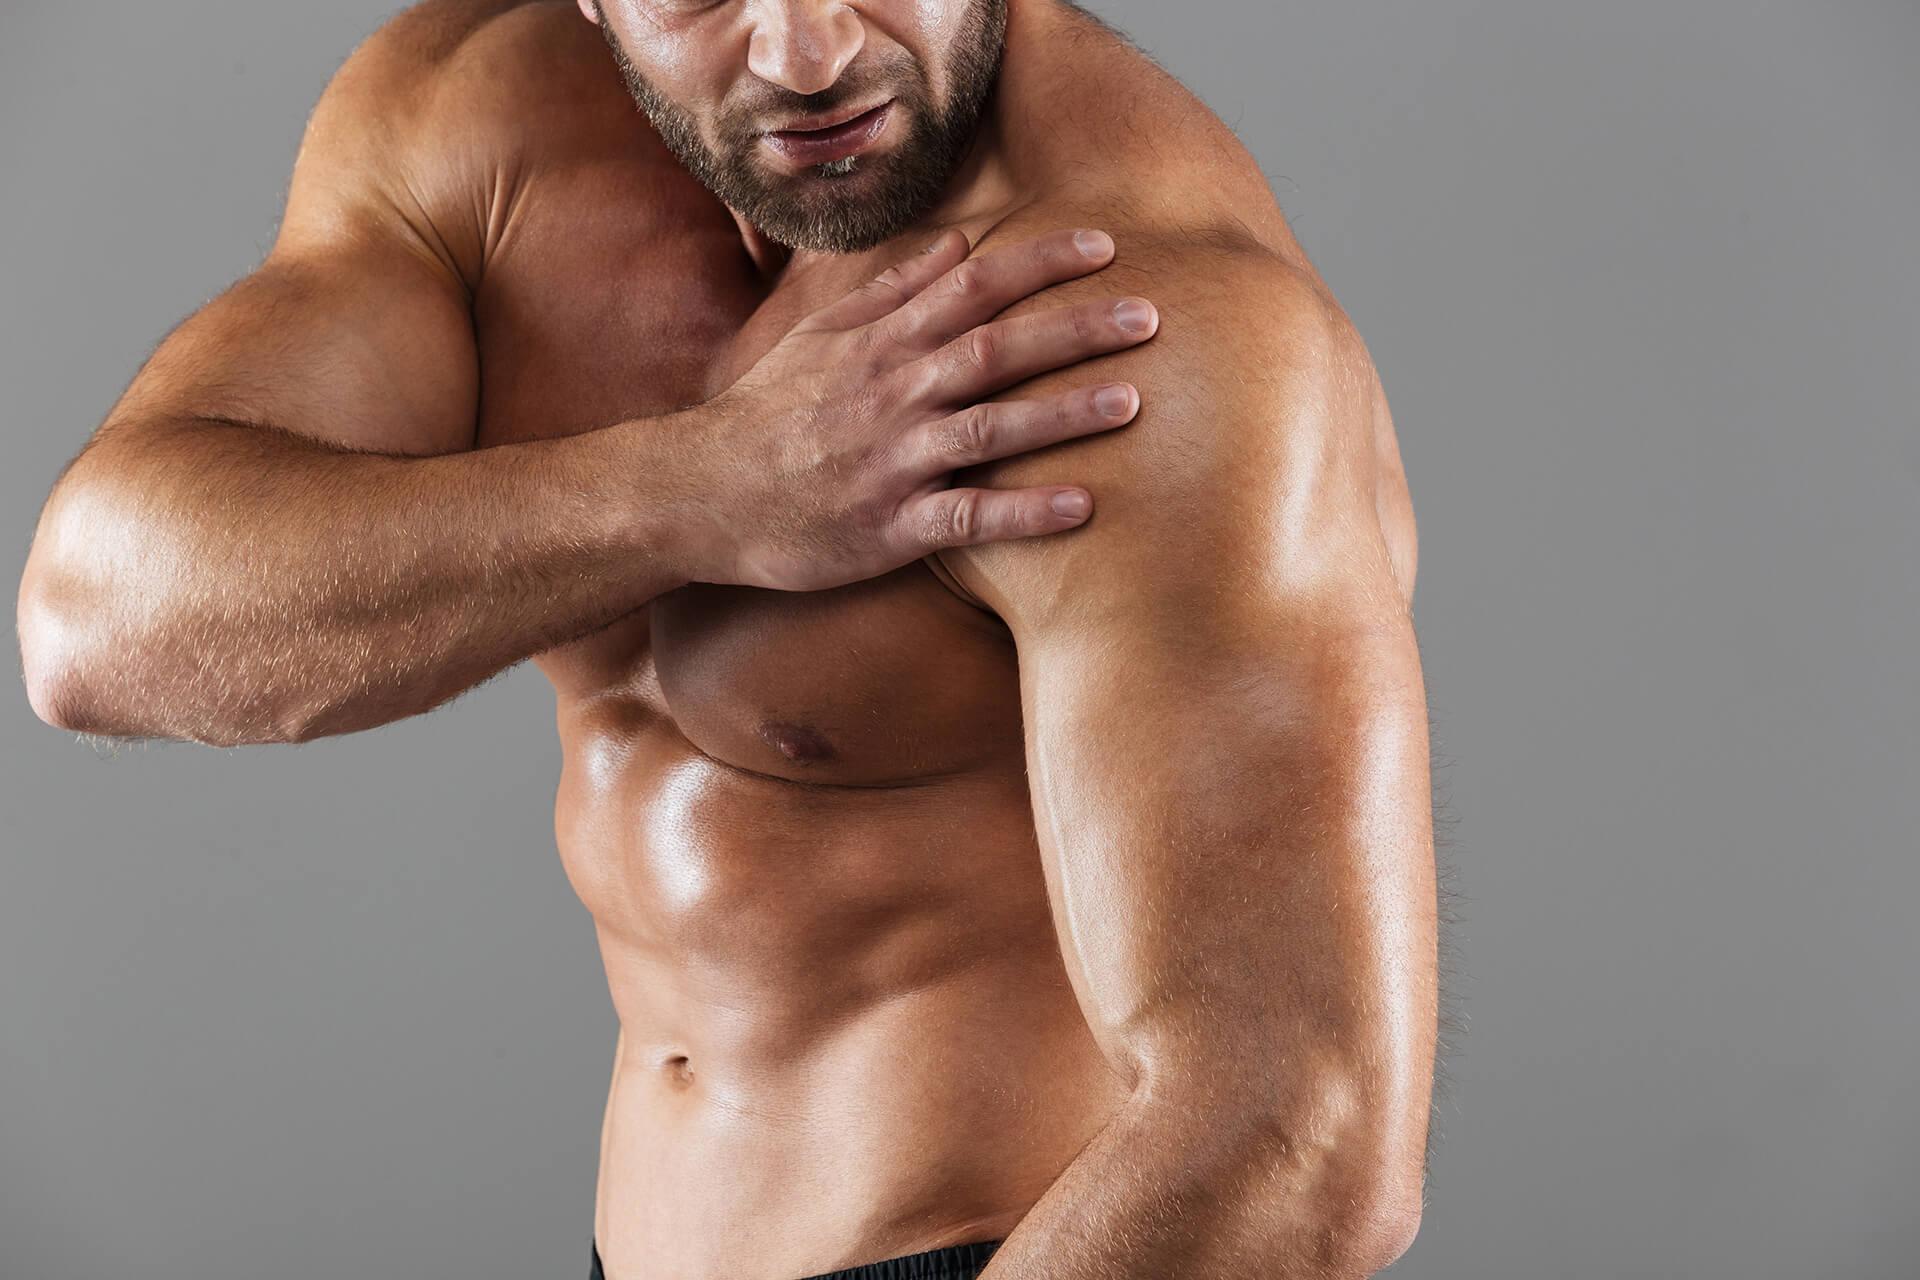 ejercicios omalgia o dolor de hombro